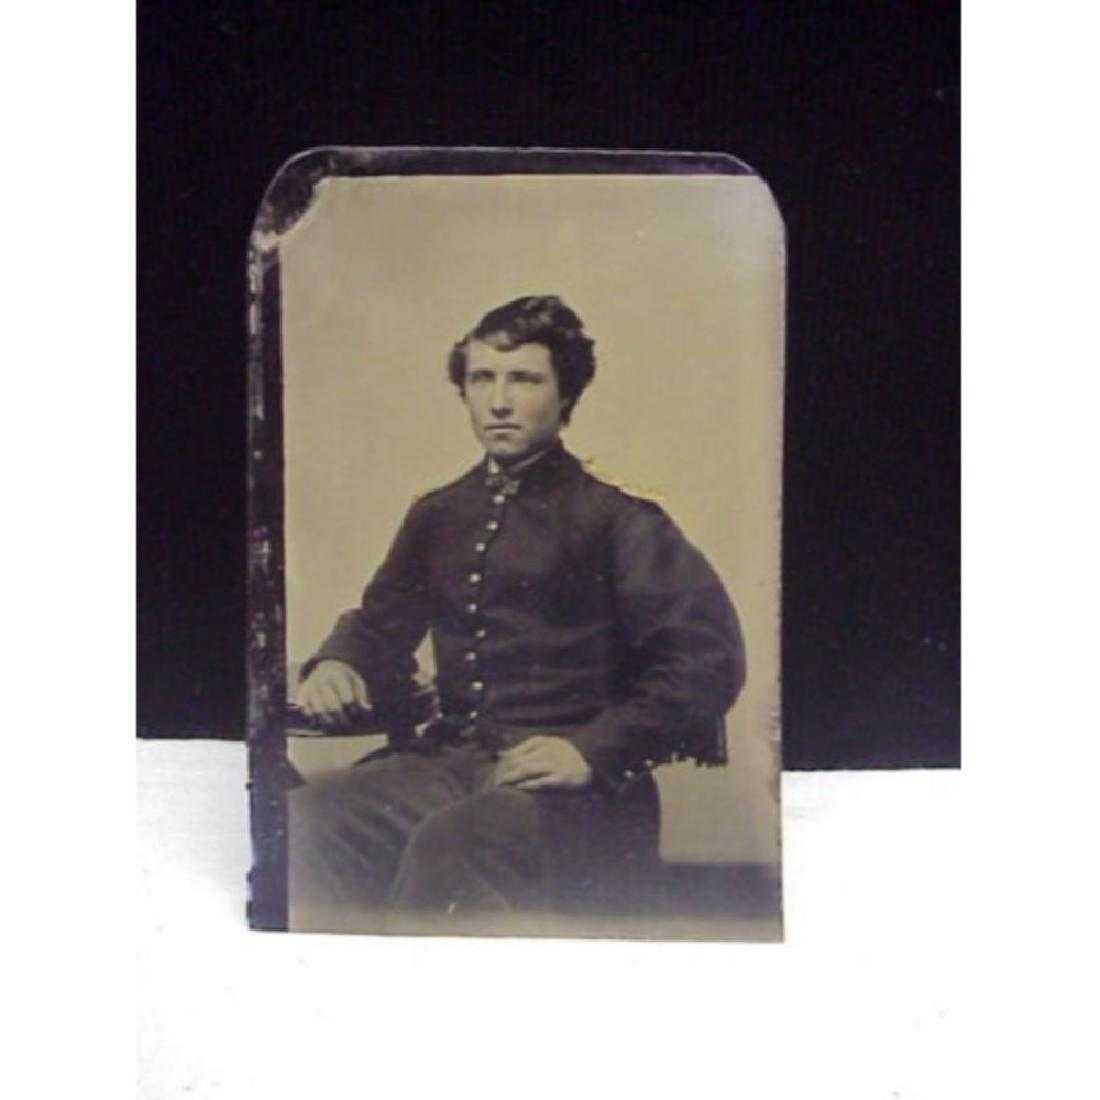 Antique Civil War Union Soldier Tintype